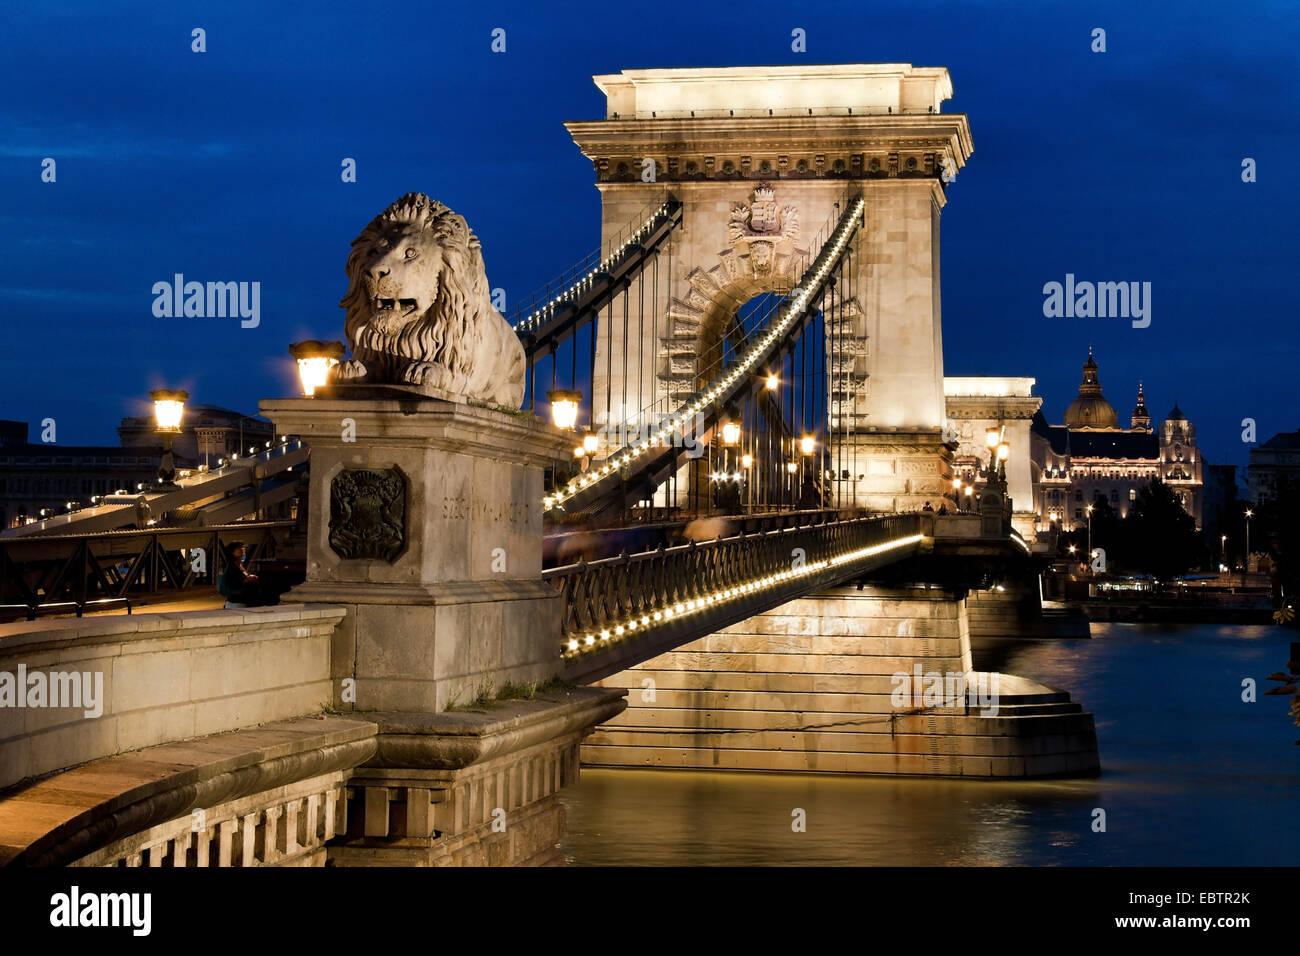 Budapest, Chain bridge in the evening, Hungary, Budapest Stock Photo